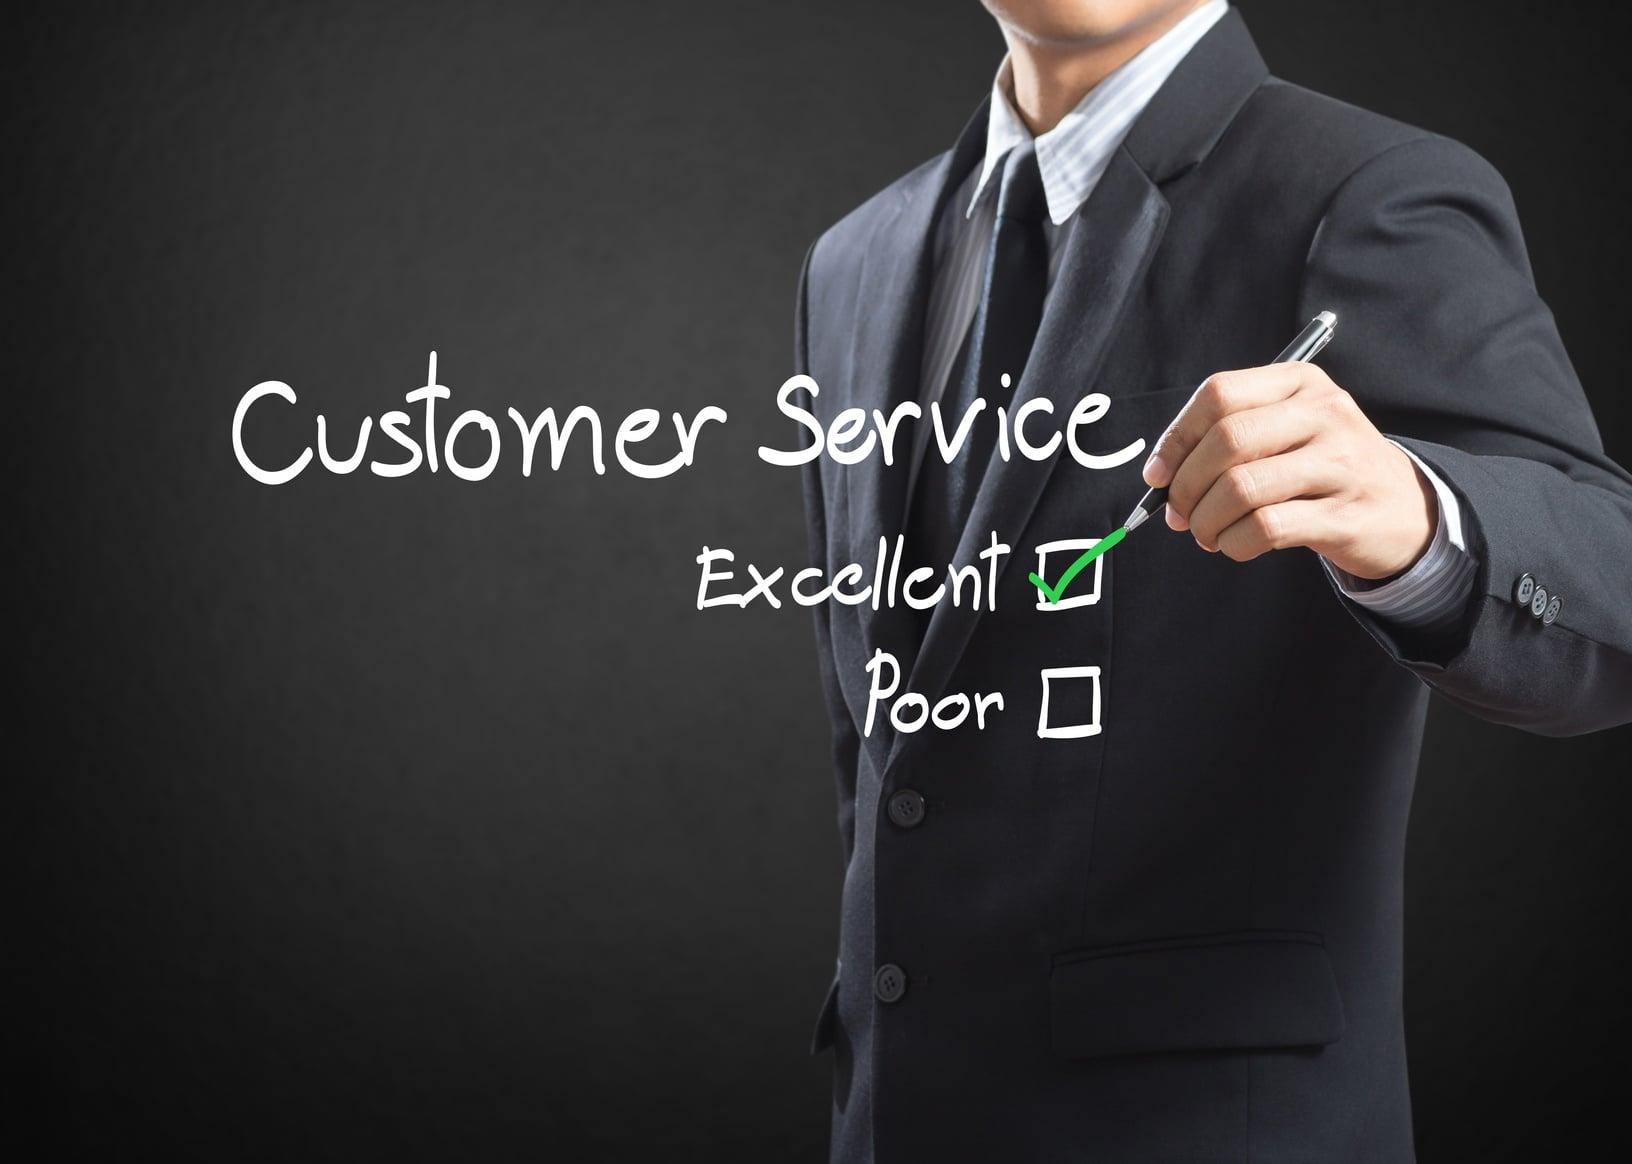 Provide Excellent Customer Service